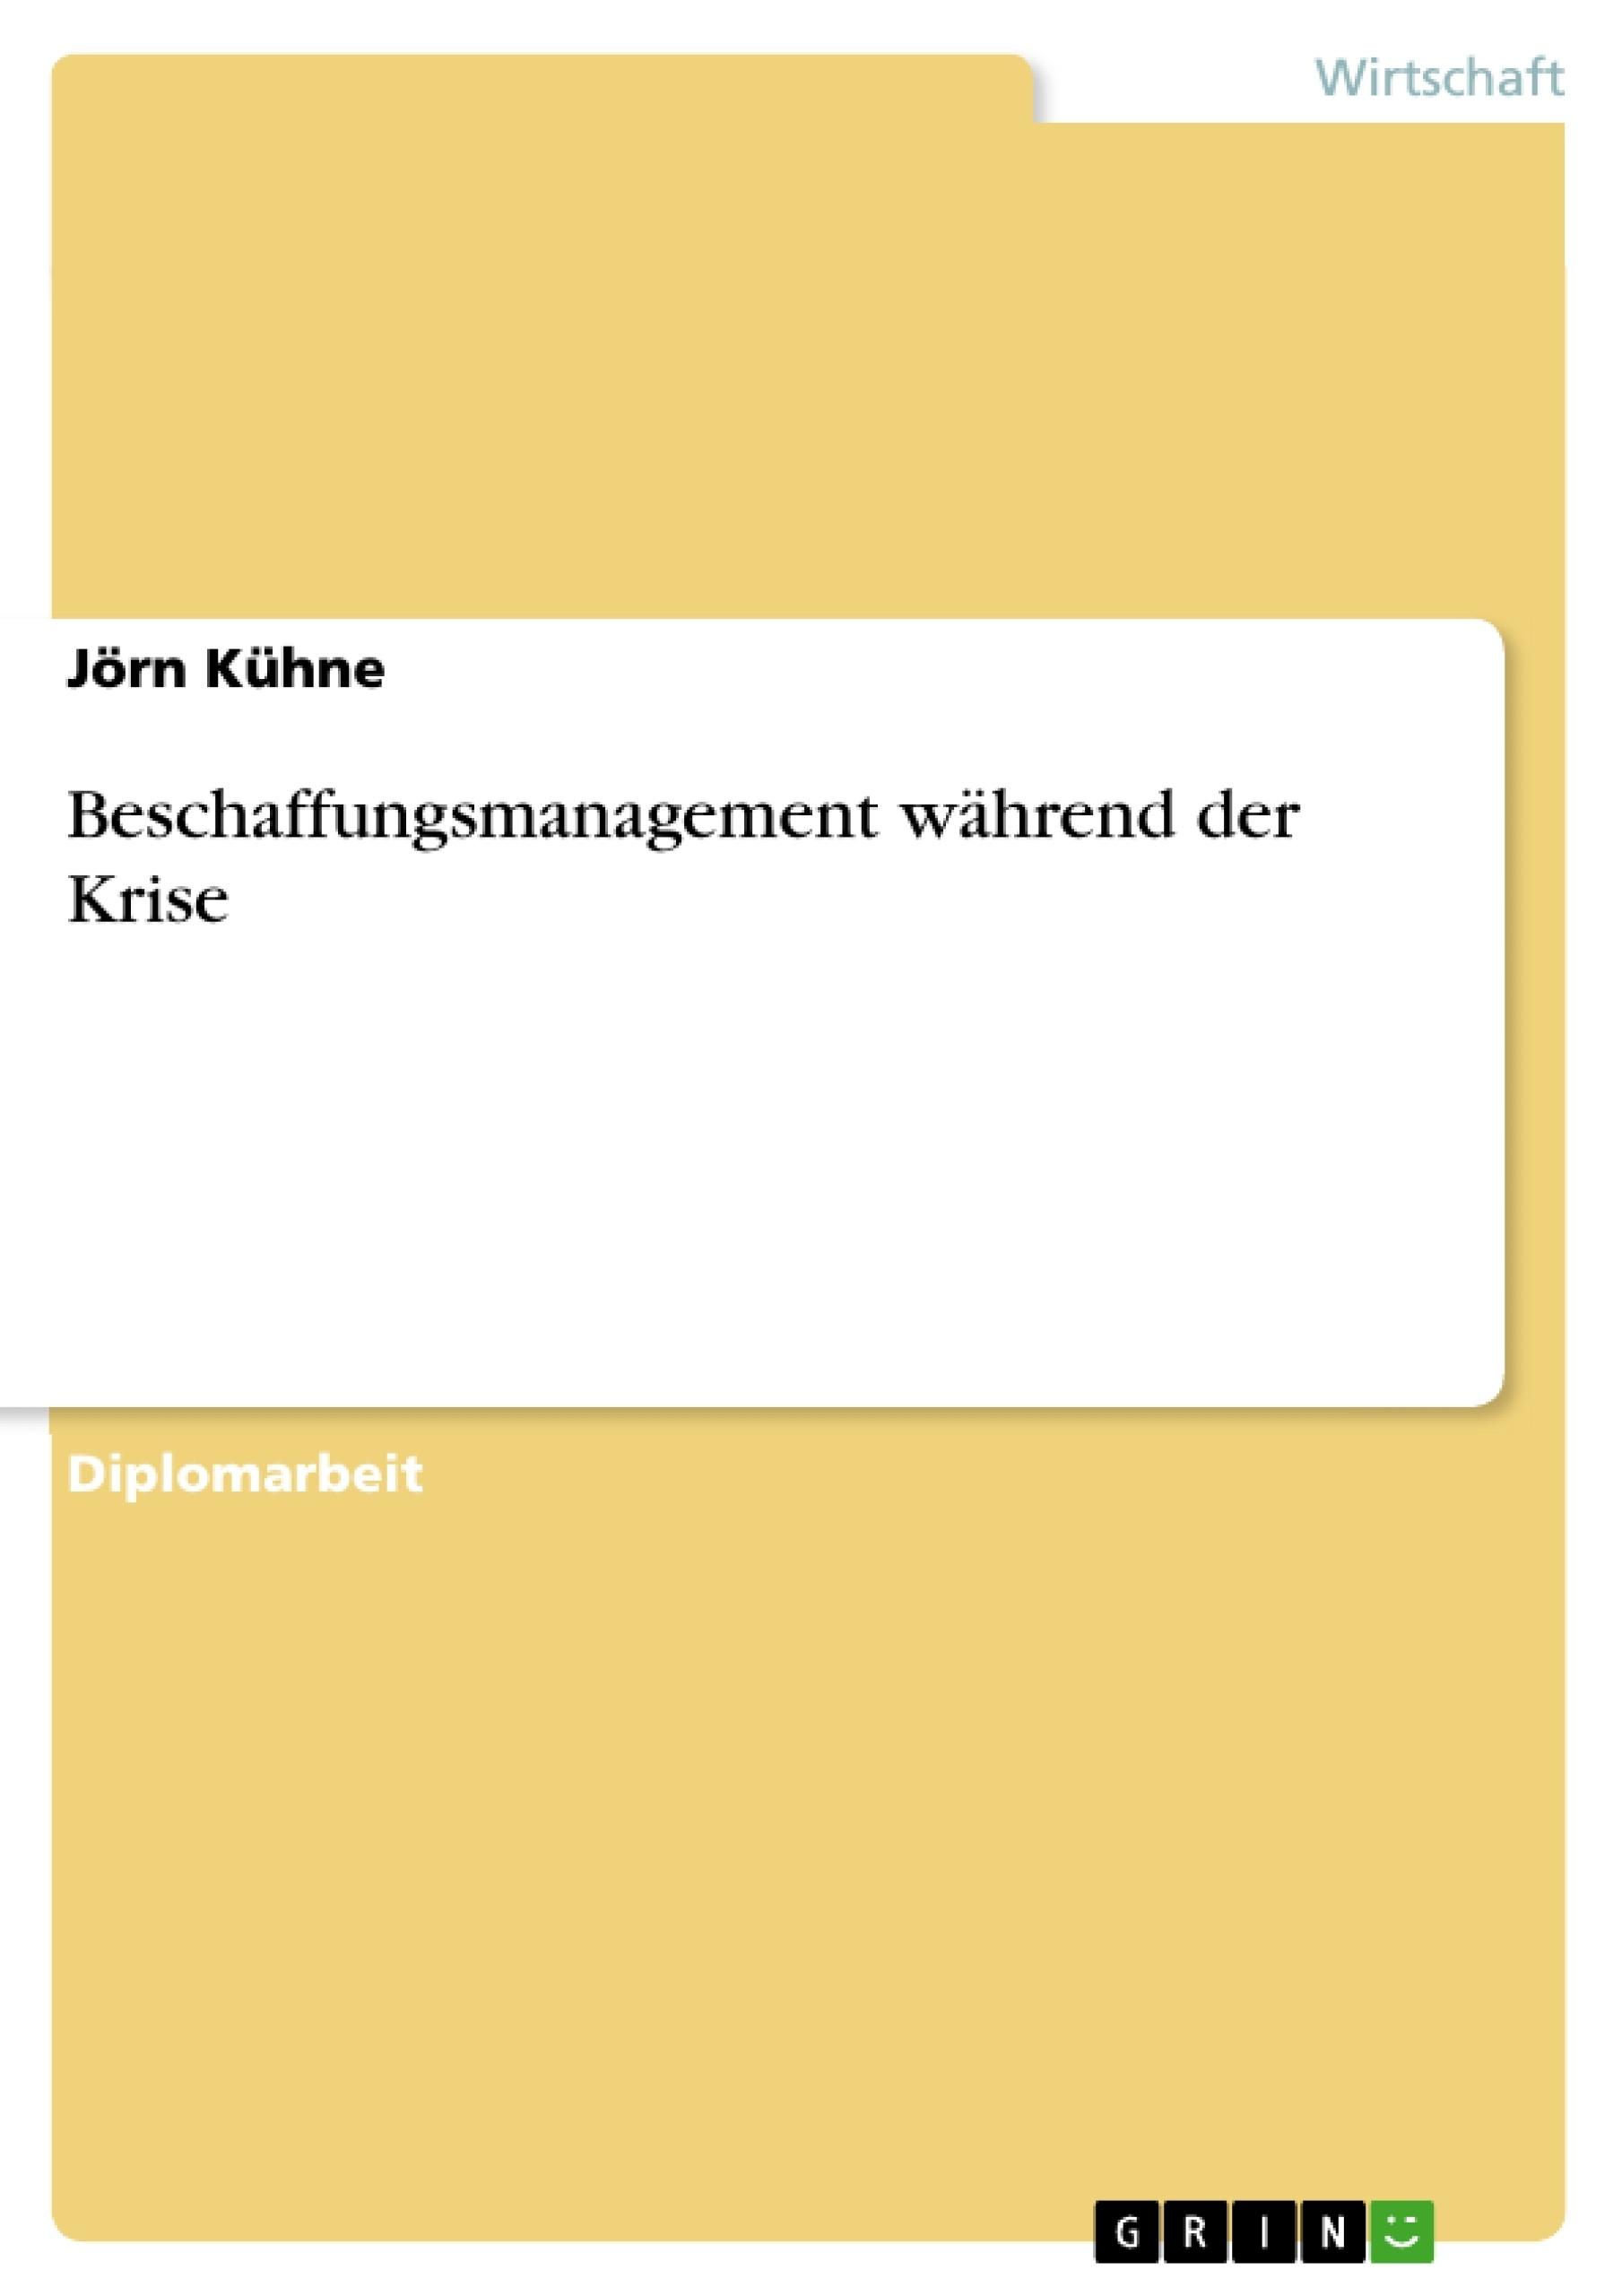 Titel: Beschaffungsmanagement während der Krise